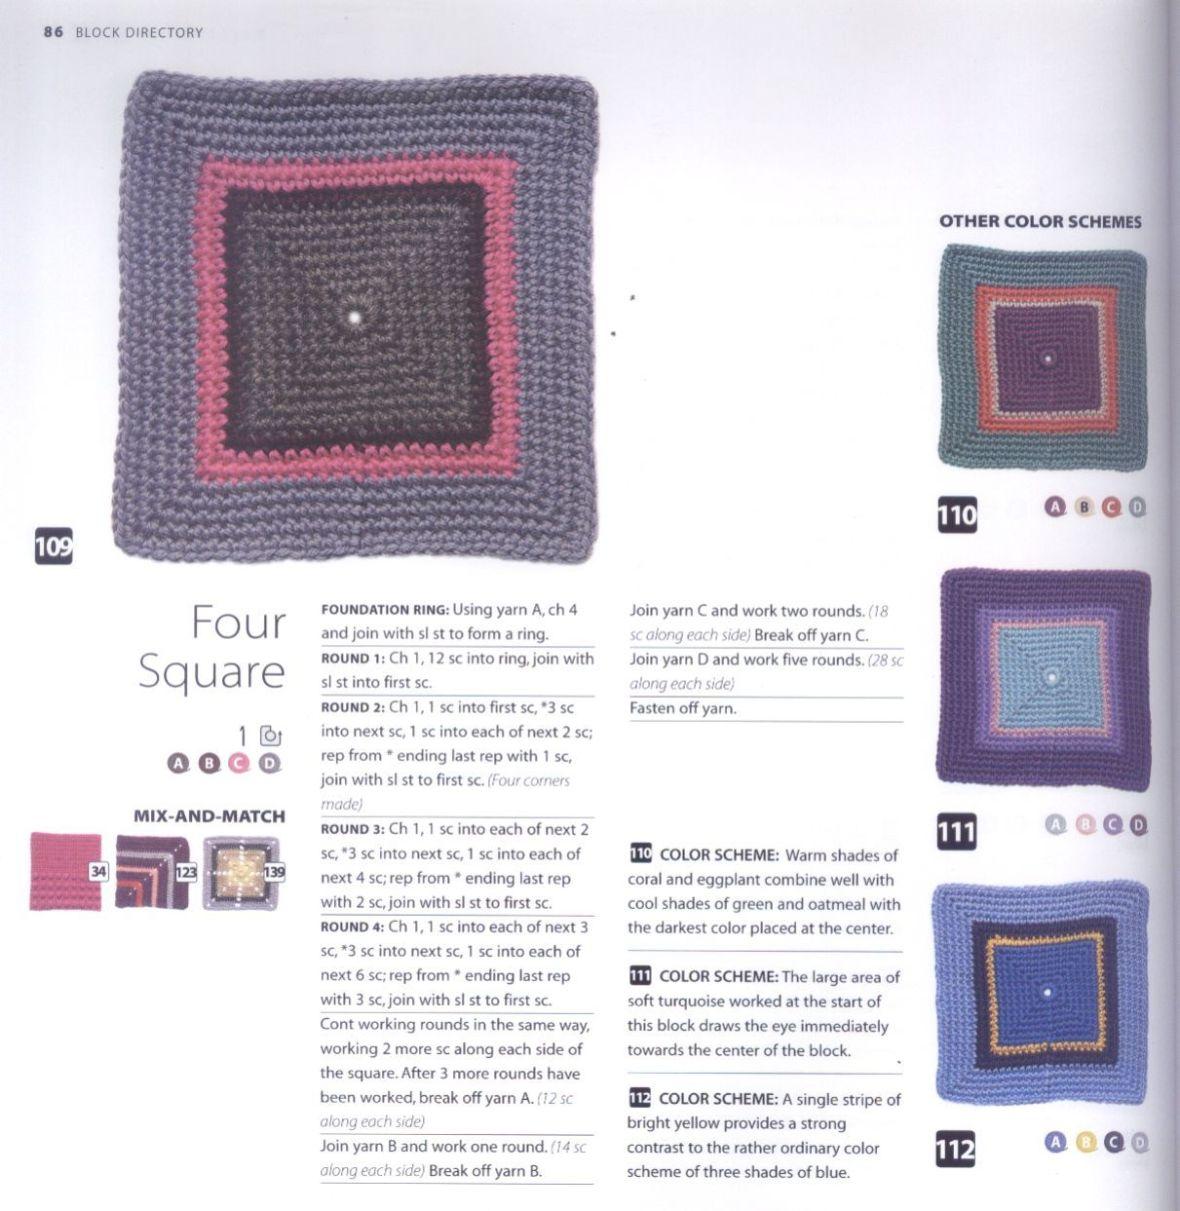 200 Crocheted Blocks for blankets, throws & Afghans 086